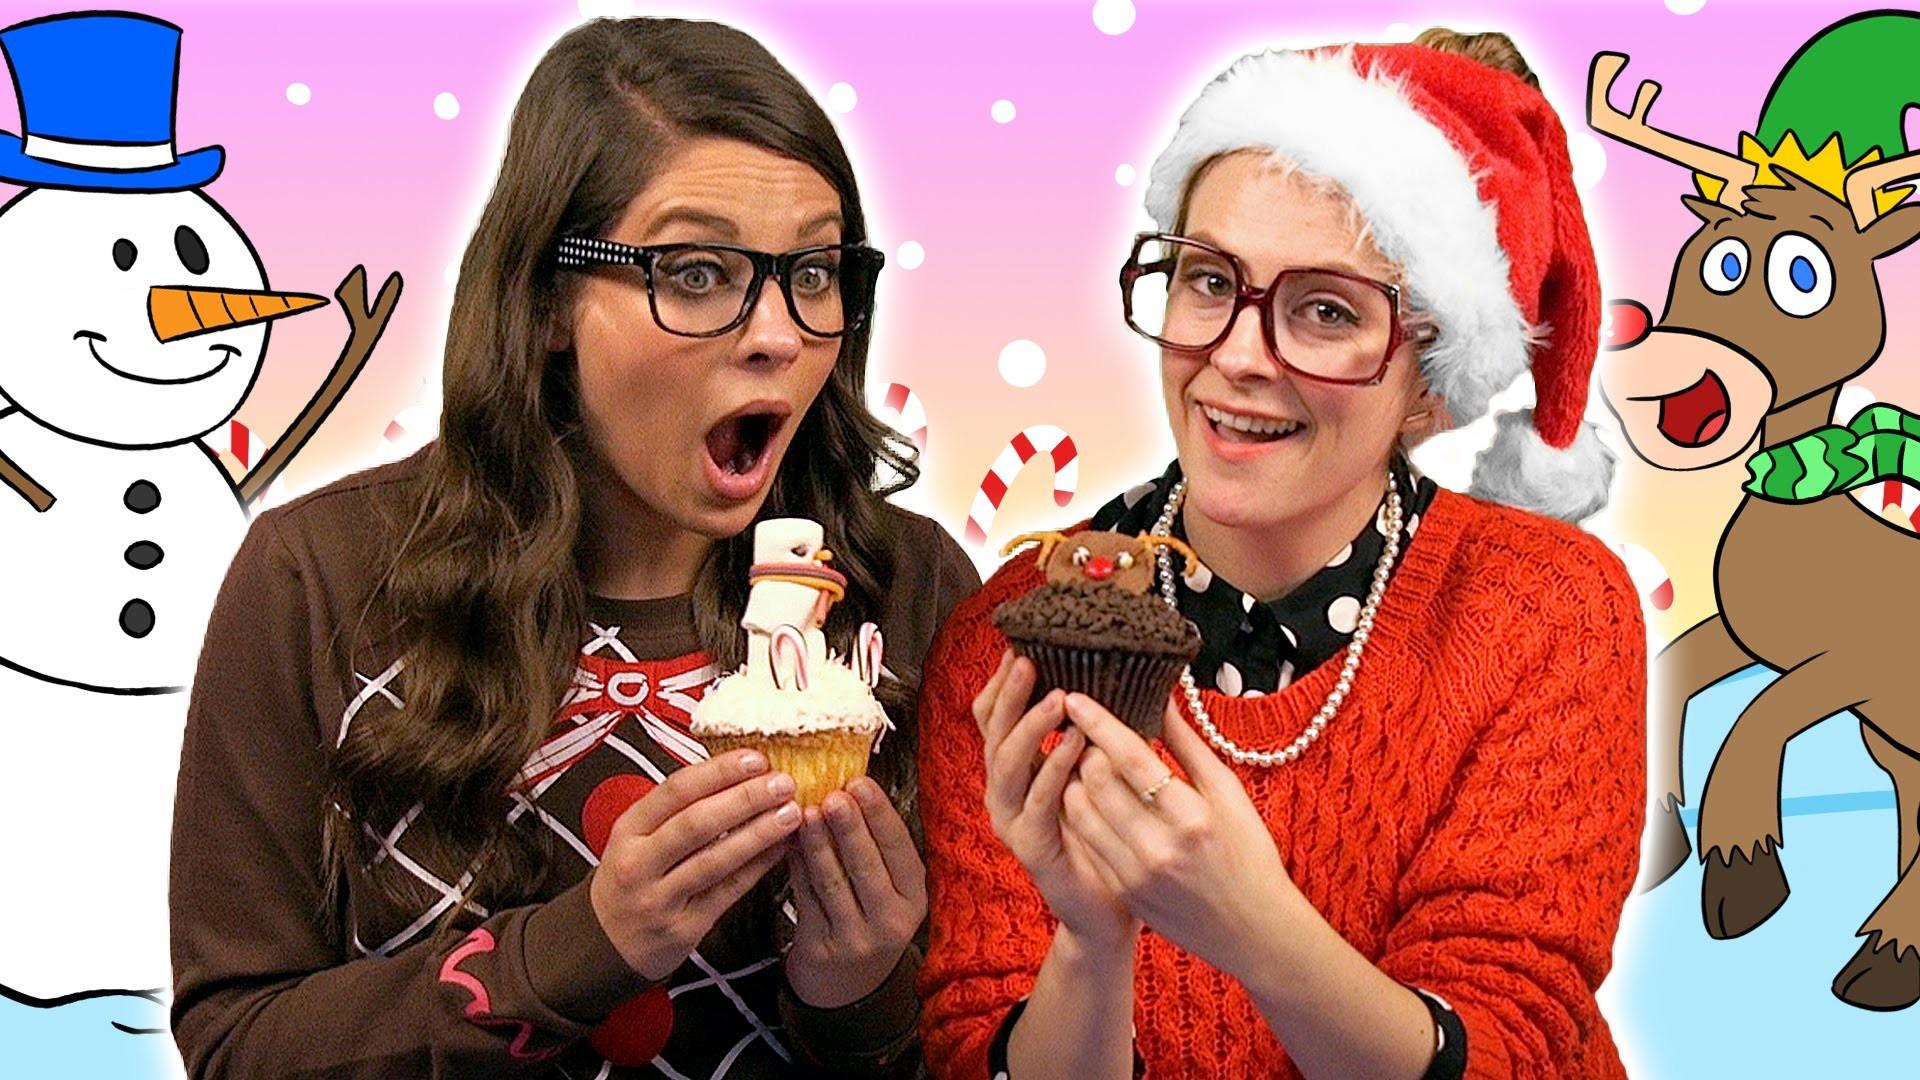 DIY Reindeer & Snowman Cupcakes - Edible Craft | A Cool School Craft with Crafty Carol & Ms. Booksy